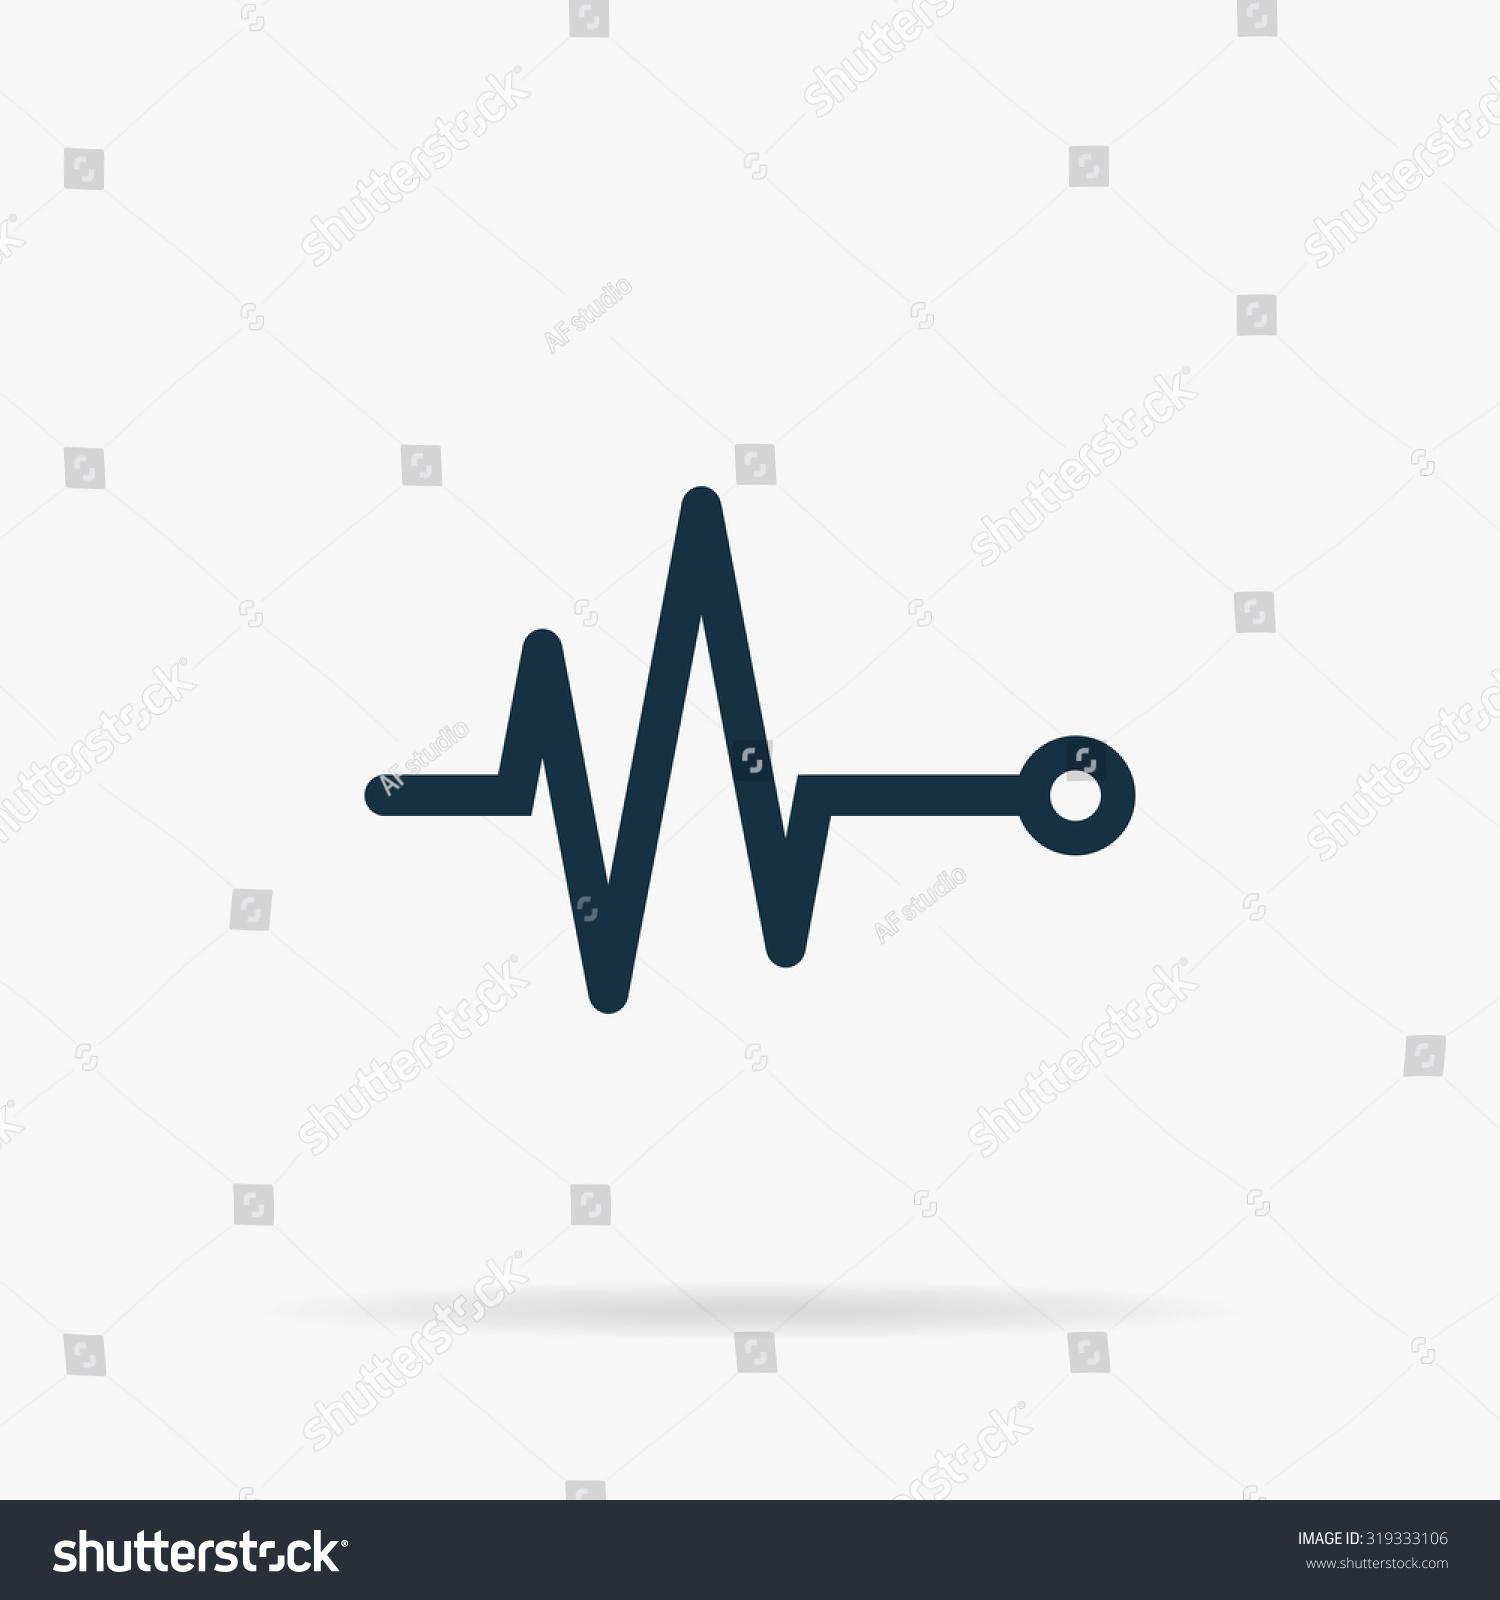 life line heart beat cardiogram flat のベクター画像素材